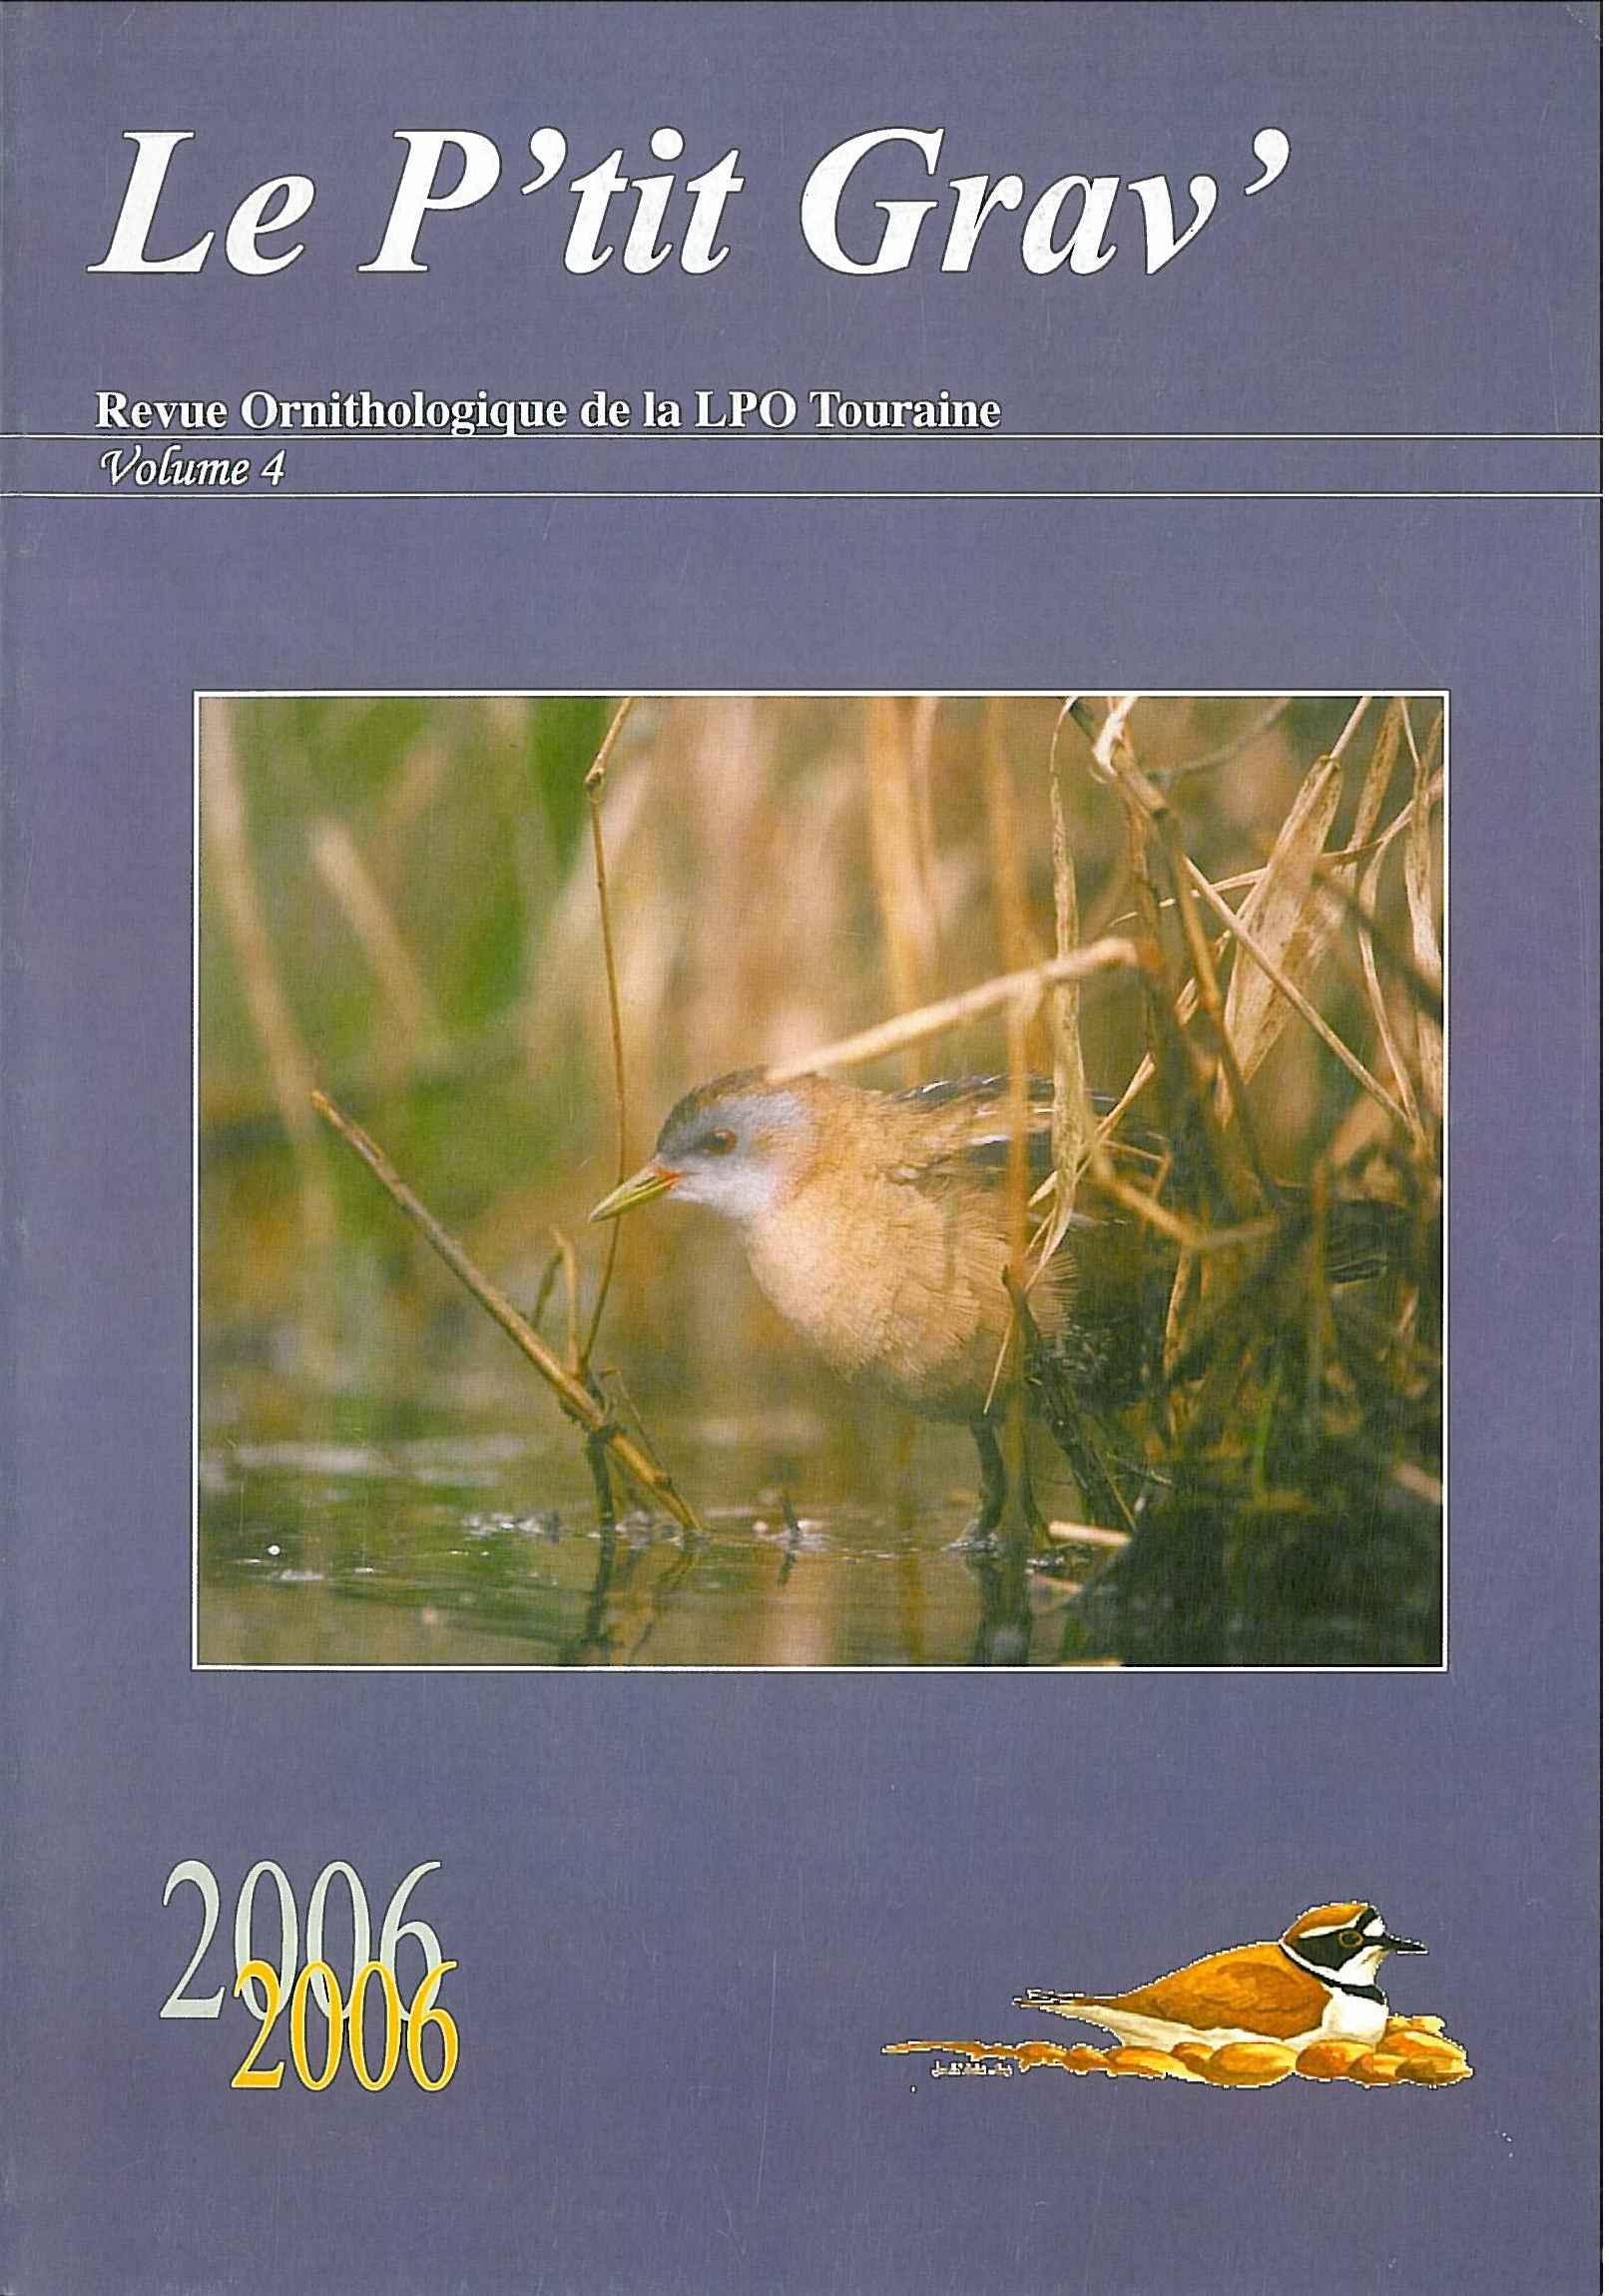 https://cdnfiles2.biolovision.net/www.faune-touraine.org/userfiles/MonDossier/PtitGravvol4.jpg